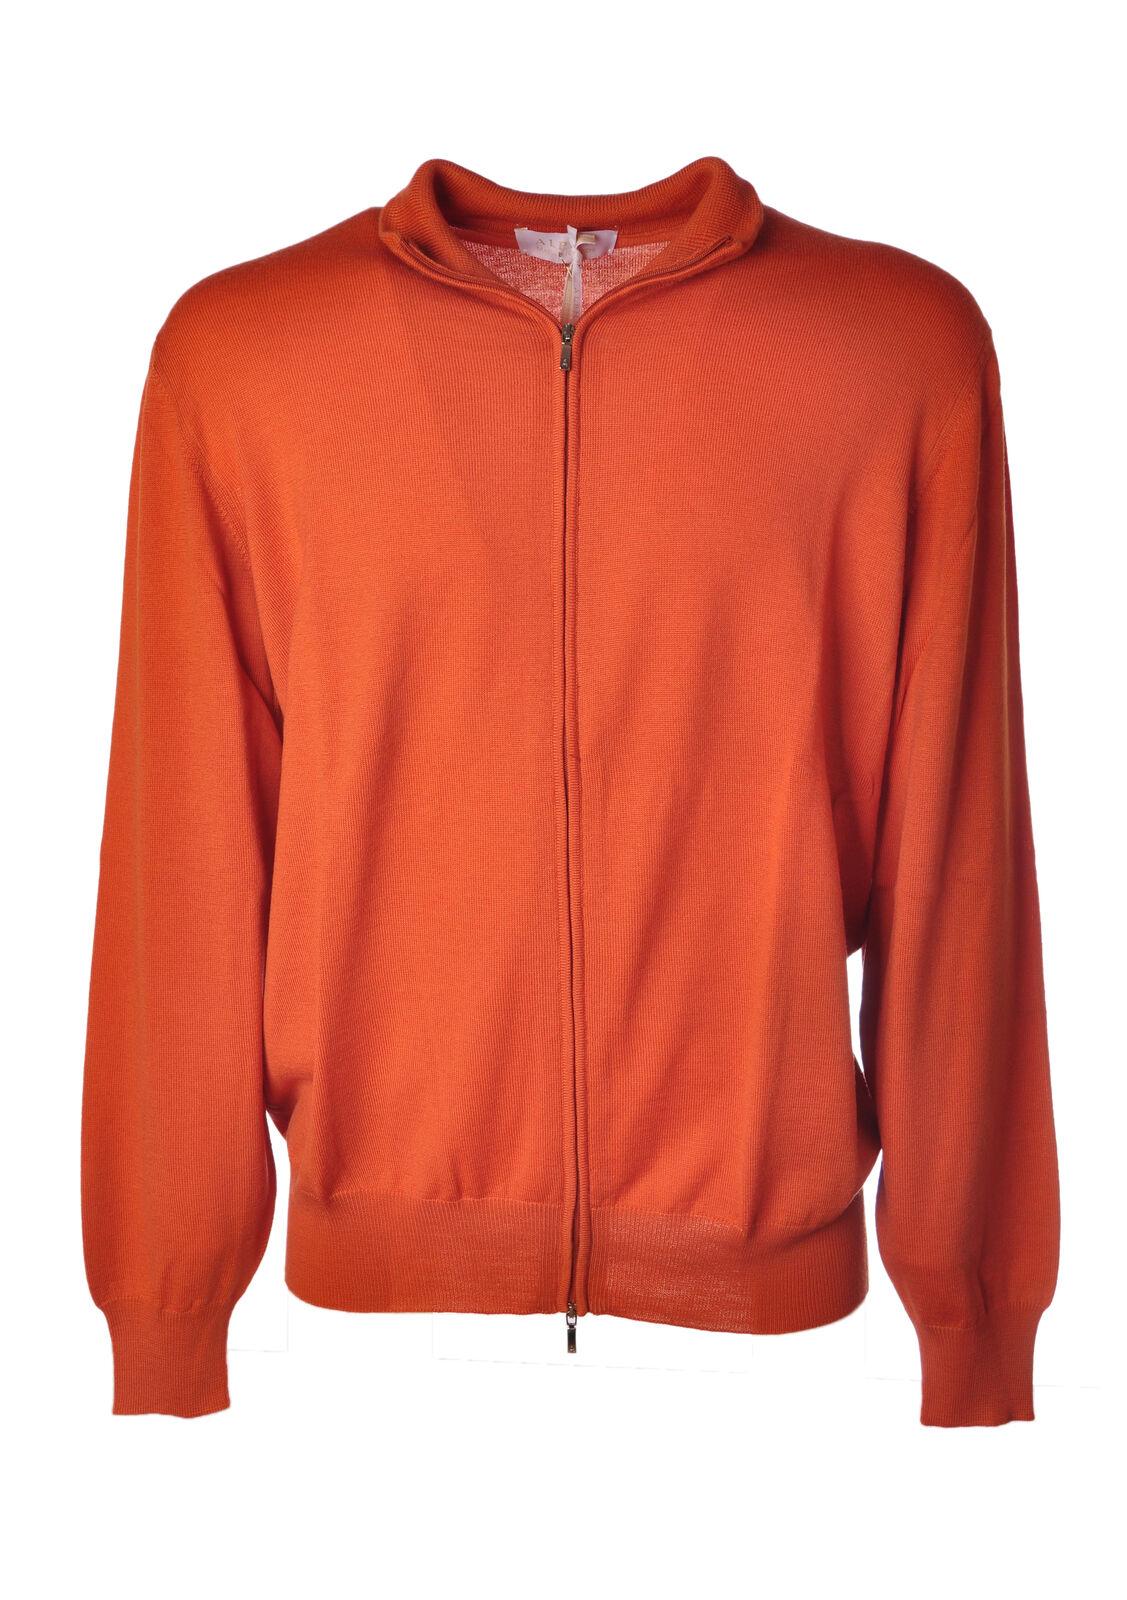 Alpha  -  Sweaters - Male - orange - 4561423A184250